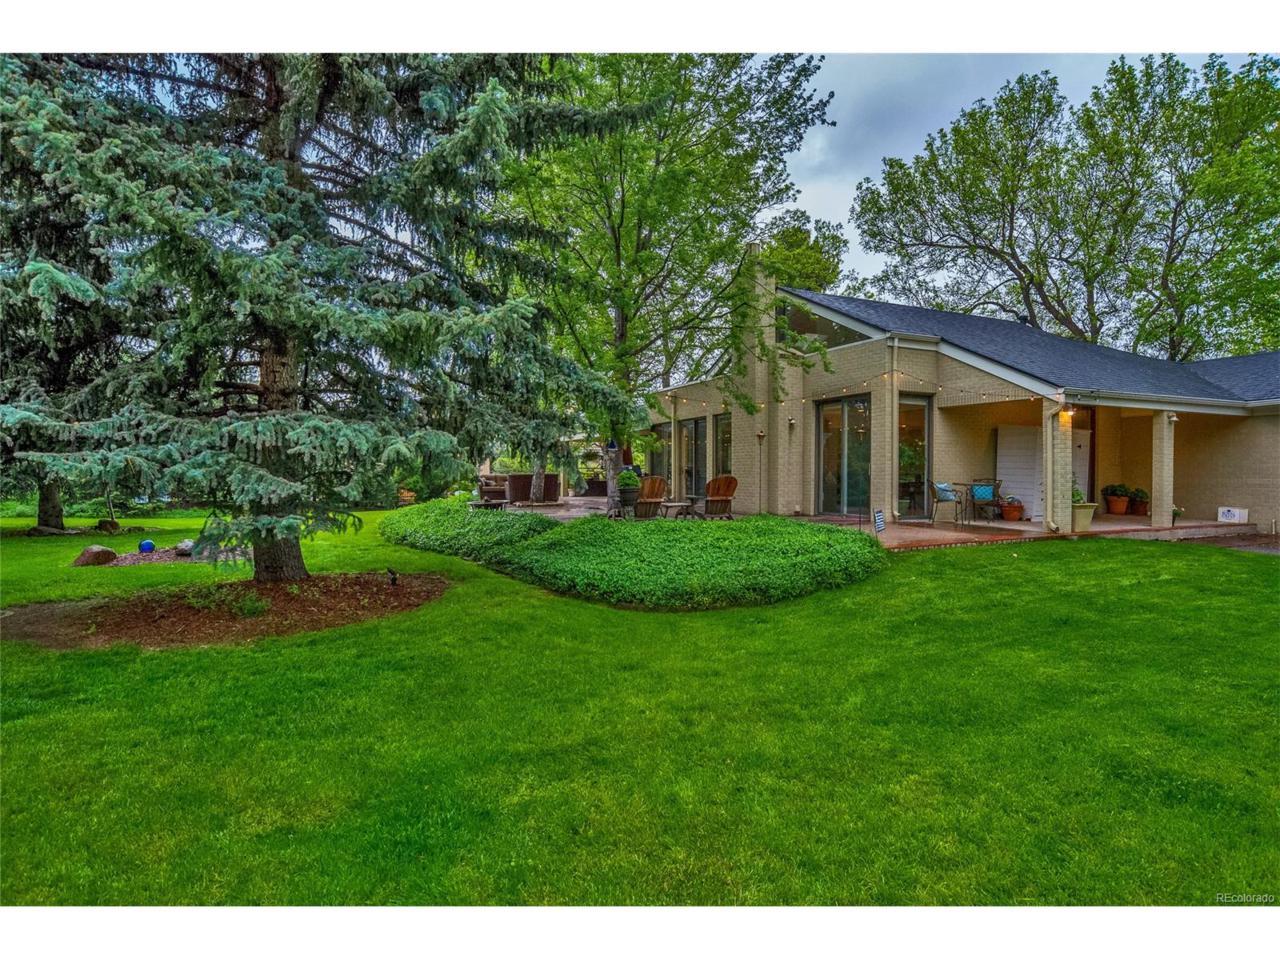 1176 E Layton Avenue, Englewood, CO 80113 (MLS #2926173) :: 8z Real Estate